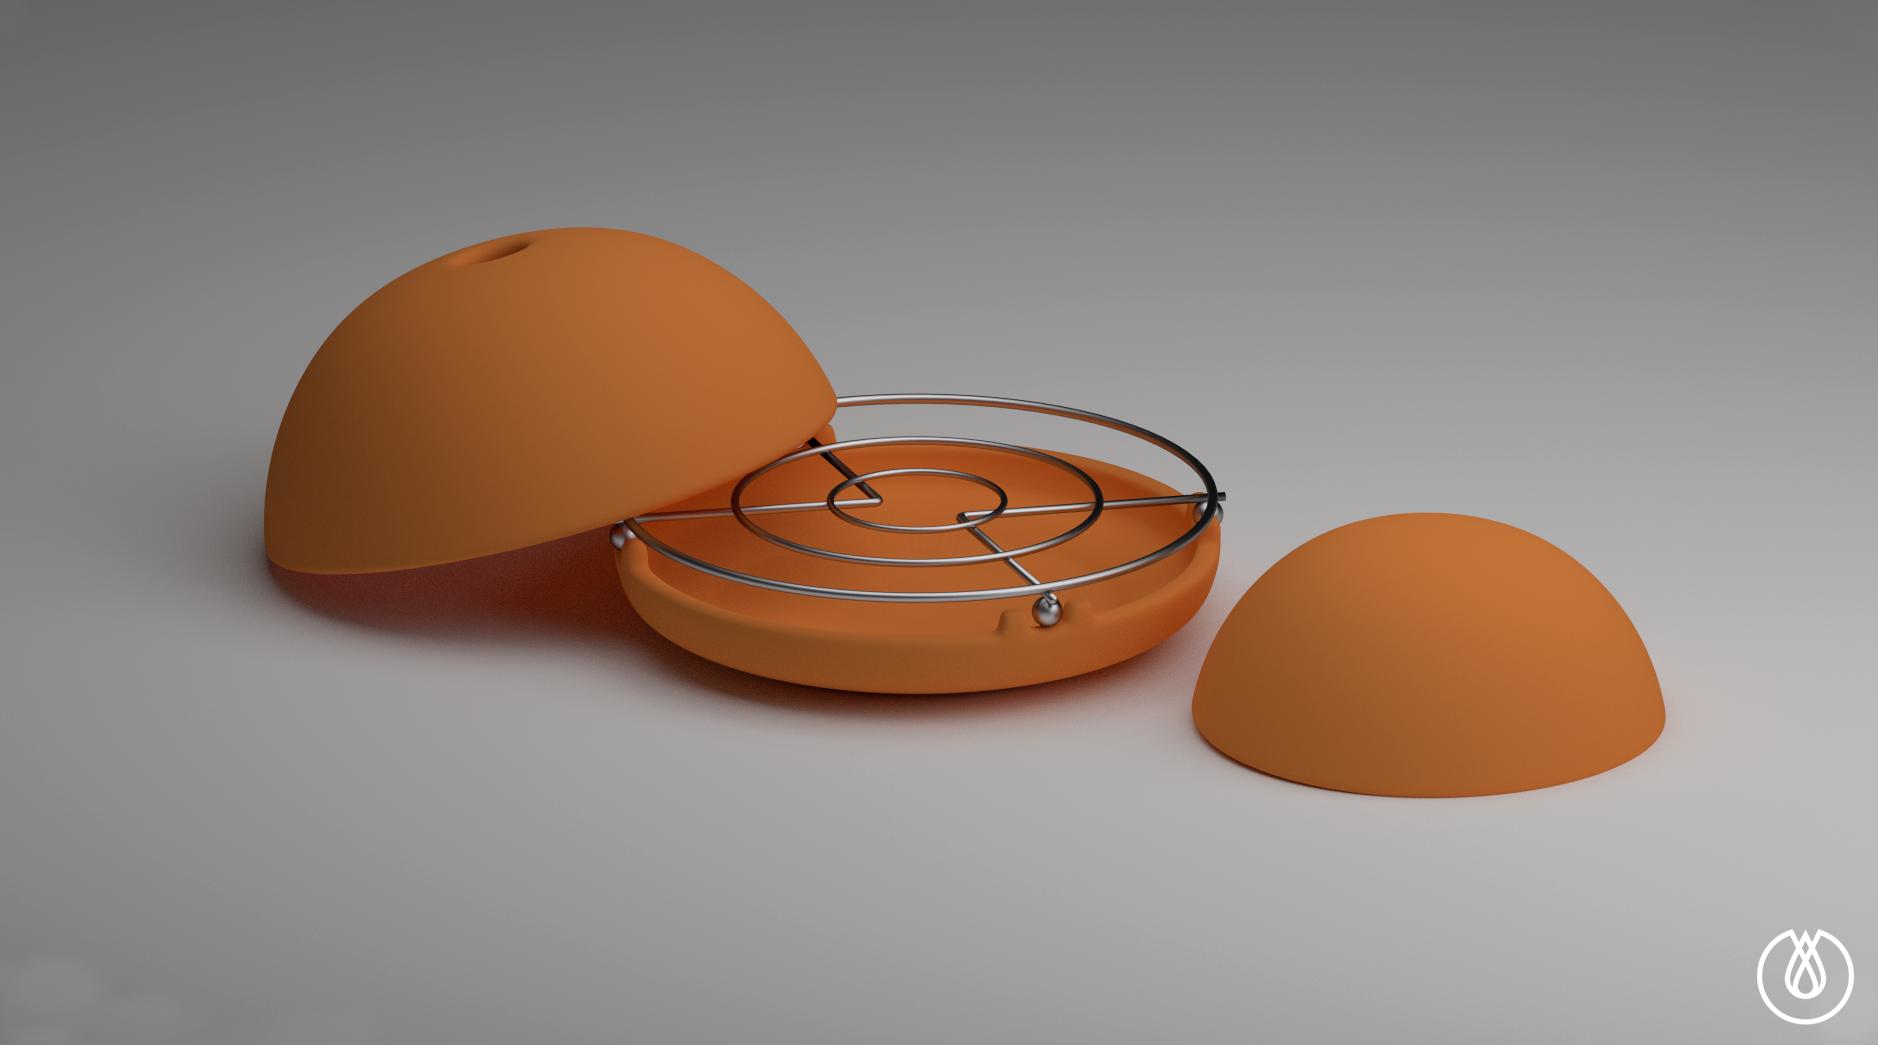 Egloo Candle Powered Heater Indiegogo